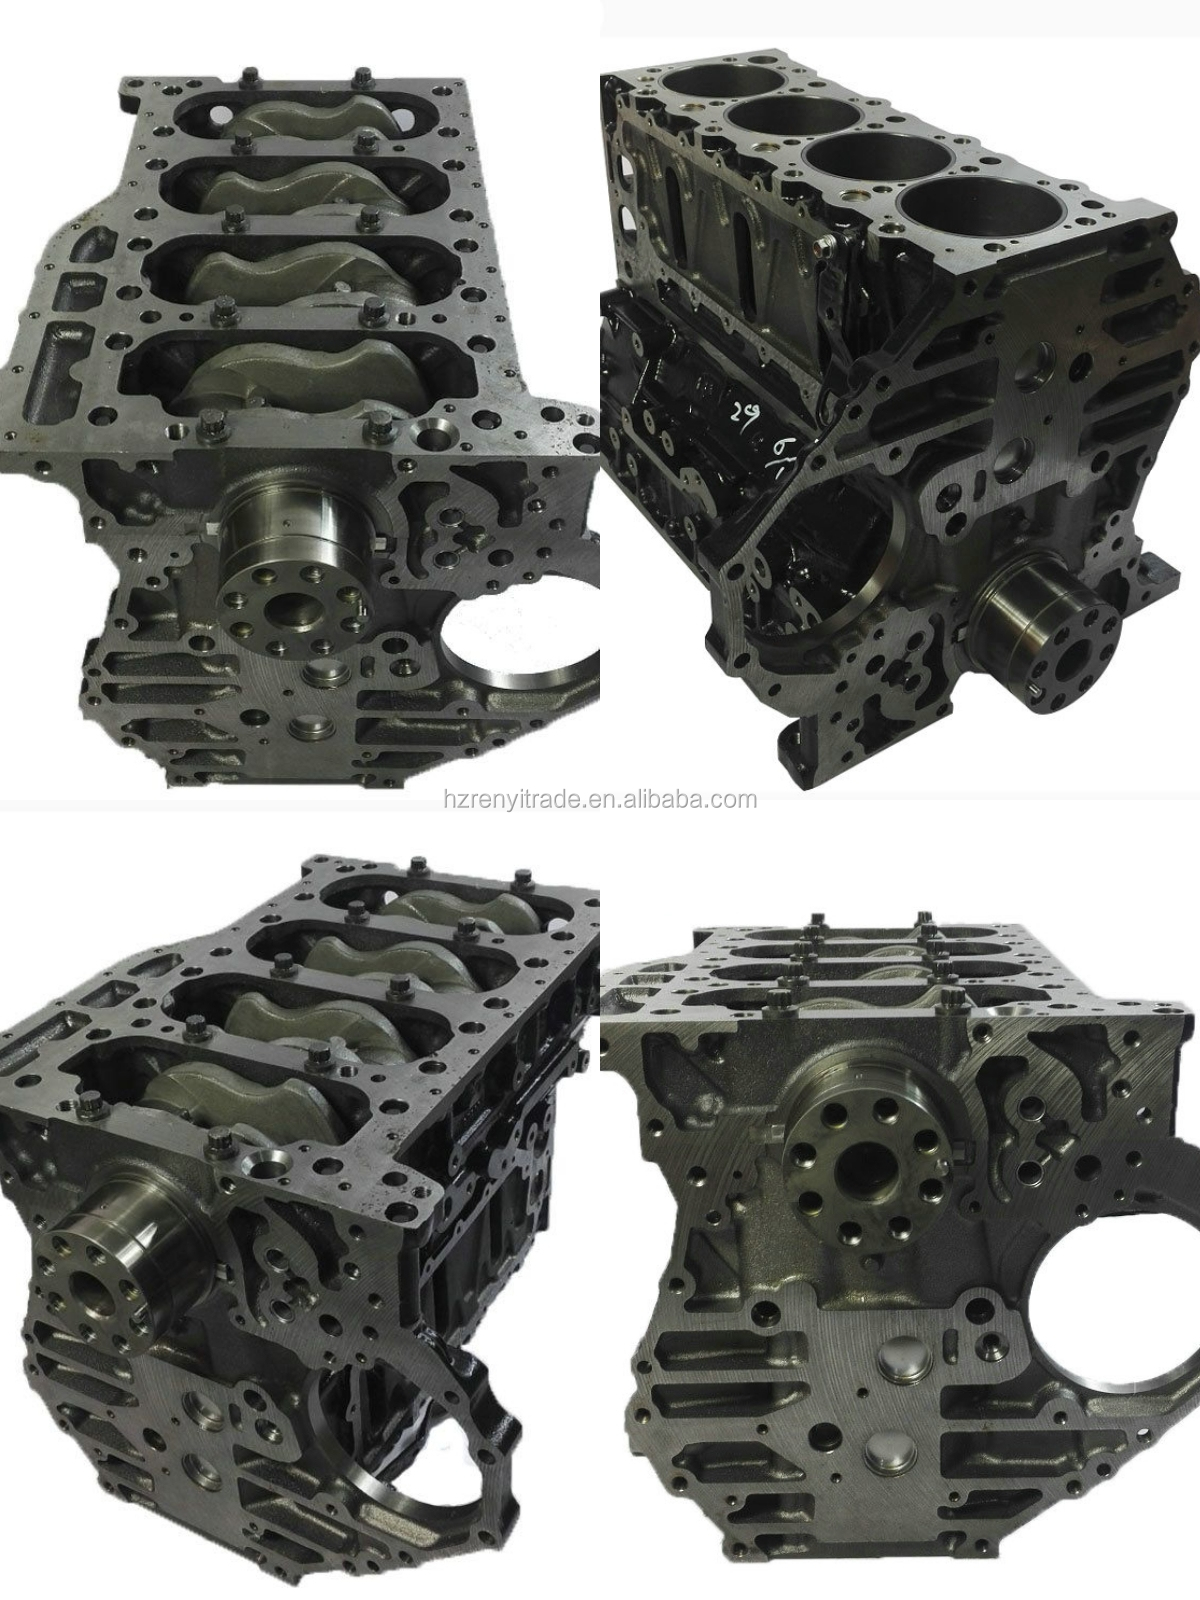 Auto parts 6HE1 6HE1T ดีเซลเครื่องยนต์เพลาข้อเหวี่ยงสำหรับ ISUZU 8-94395025-0 8943950250